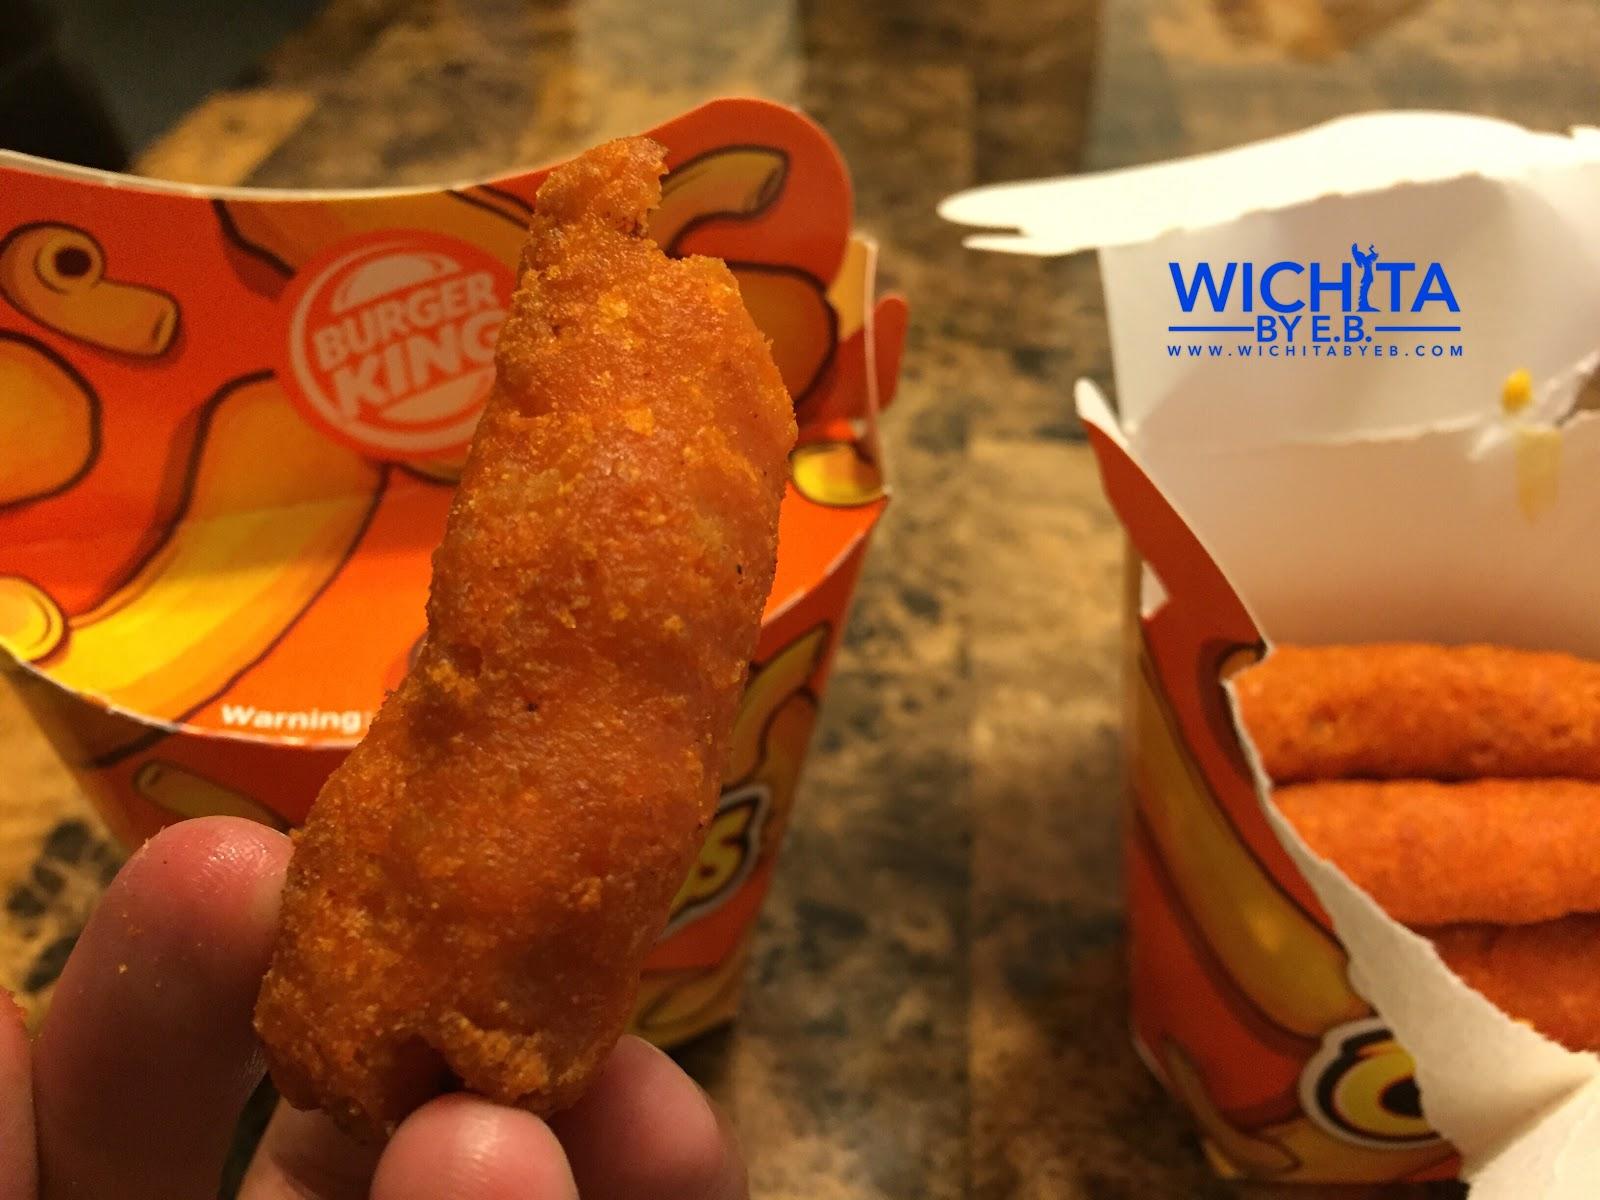 Burger Kings Mac N Cheetos Review Wichita By EB